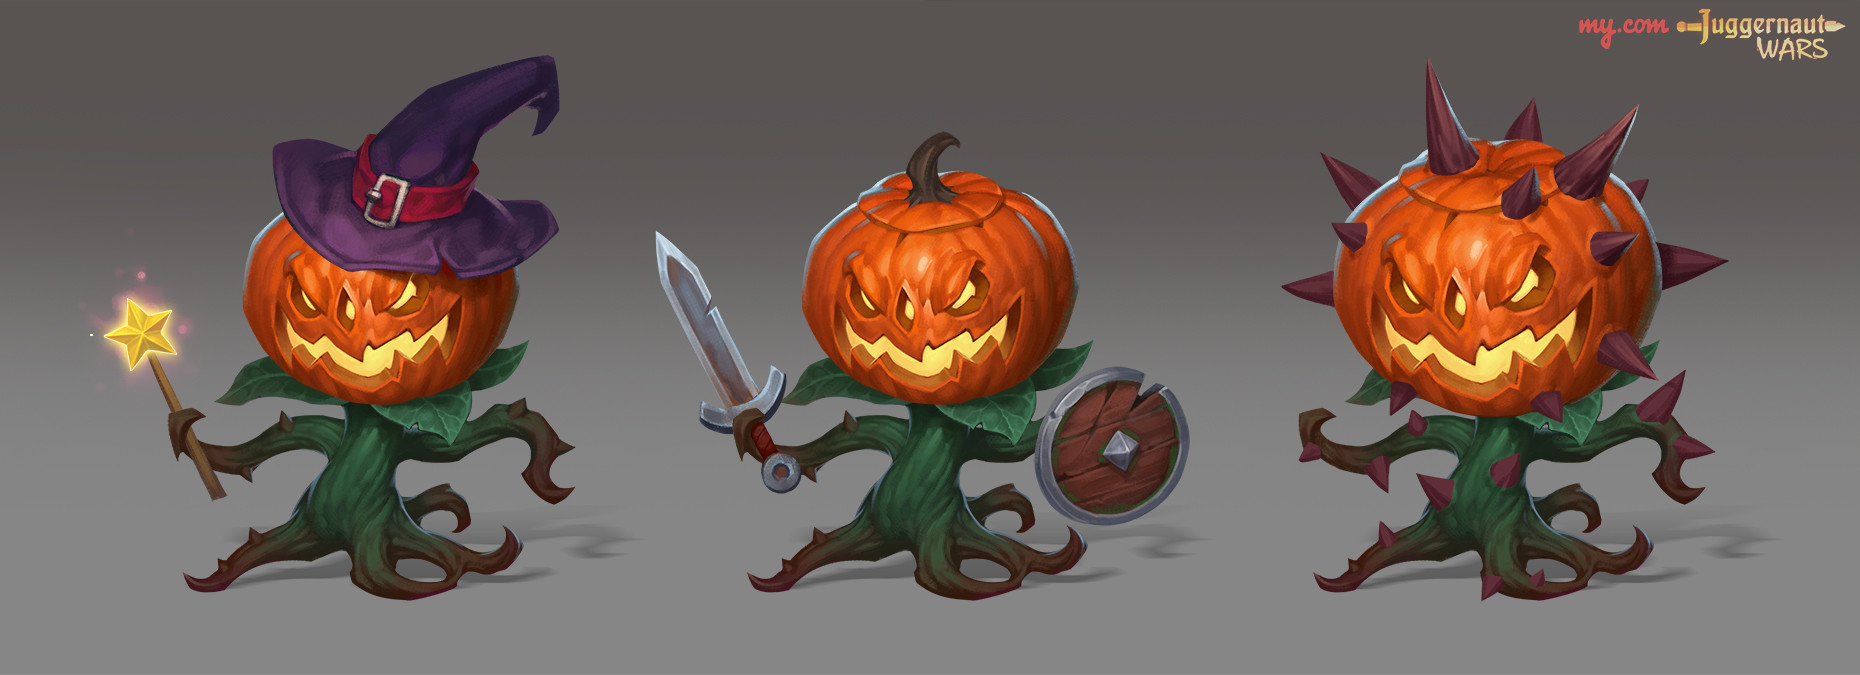 Alexander bocharov minions pumpkins logo